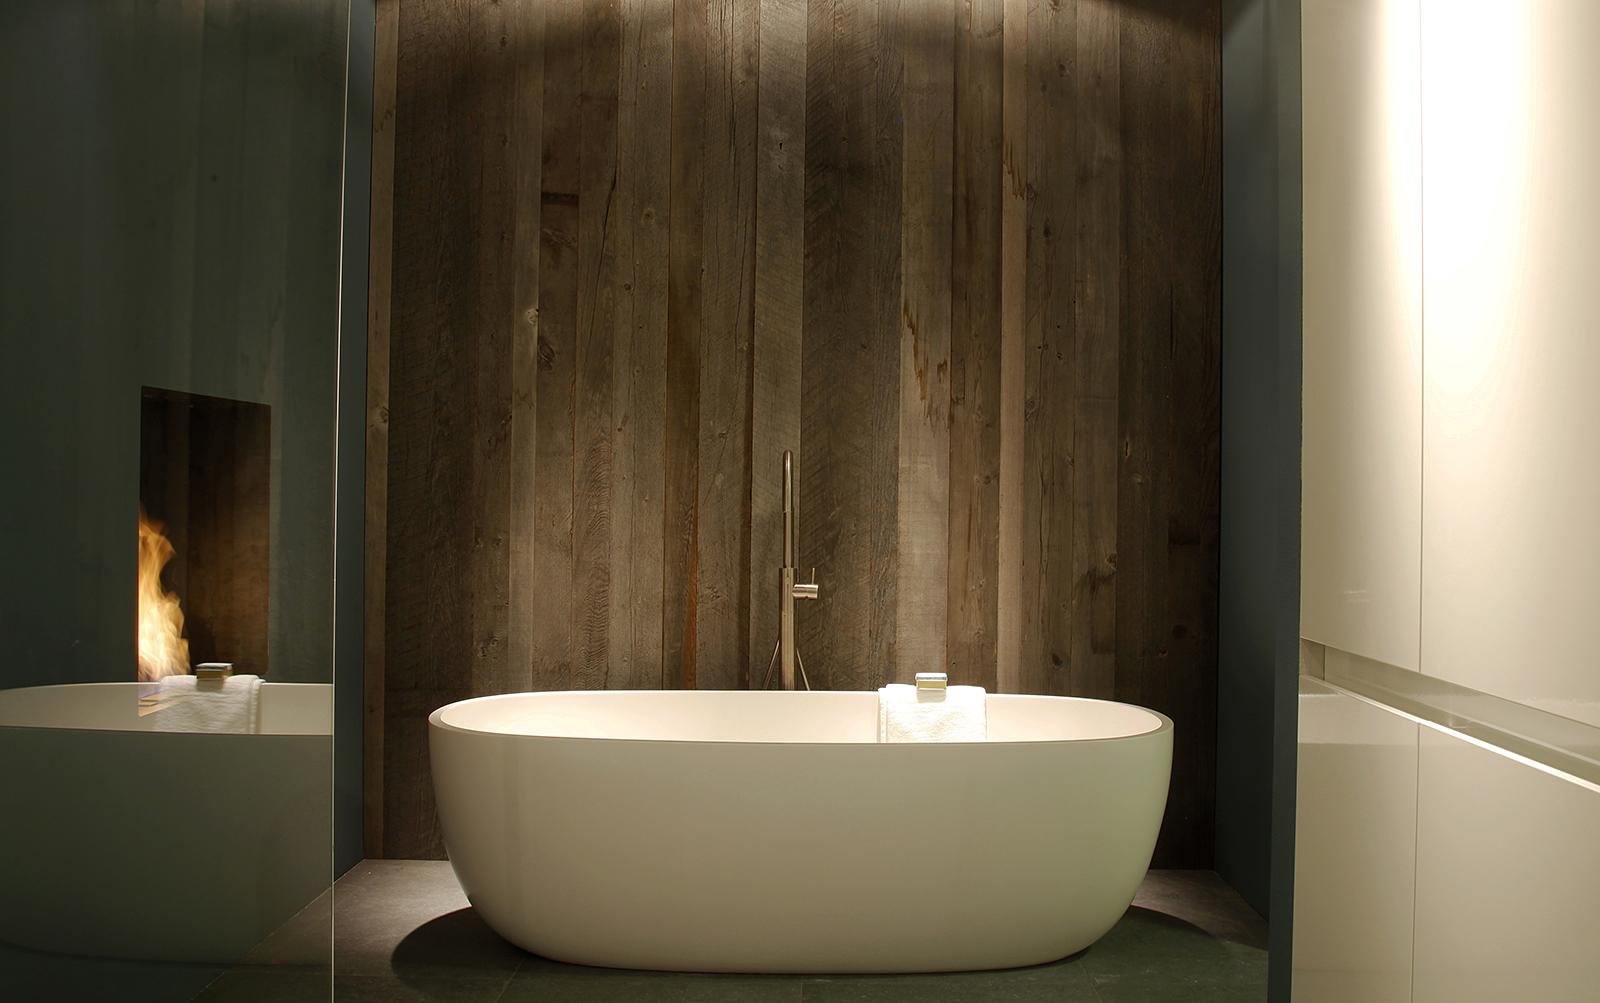 Badkamers Groningen Osloweg : Tegels groningen tgwonen